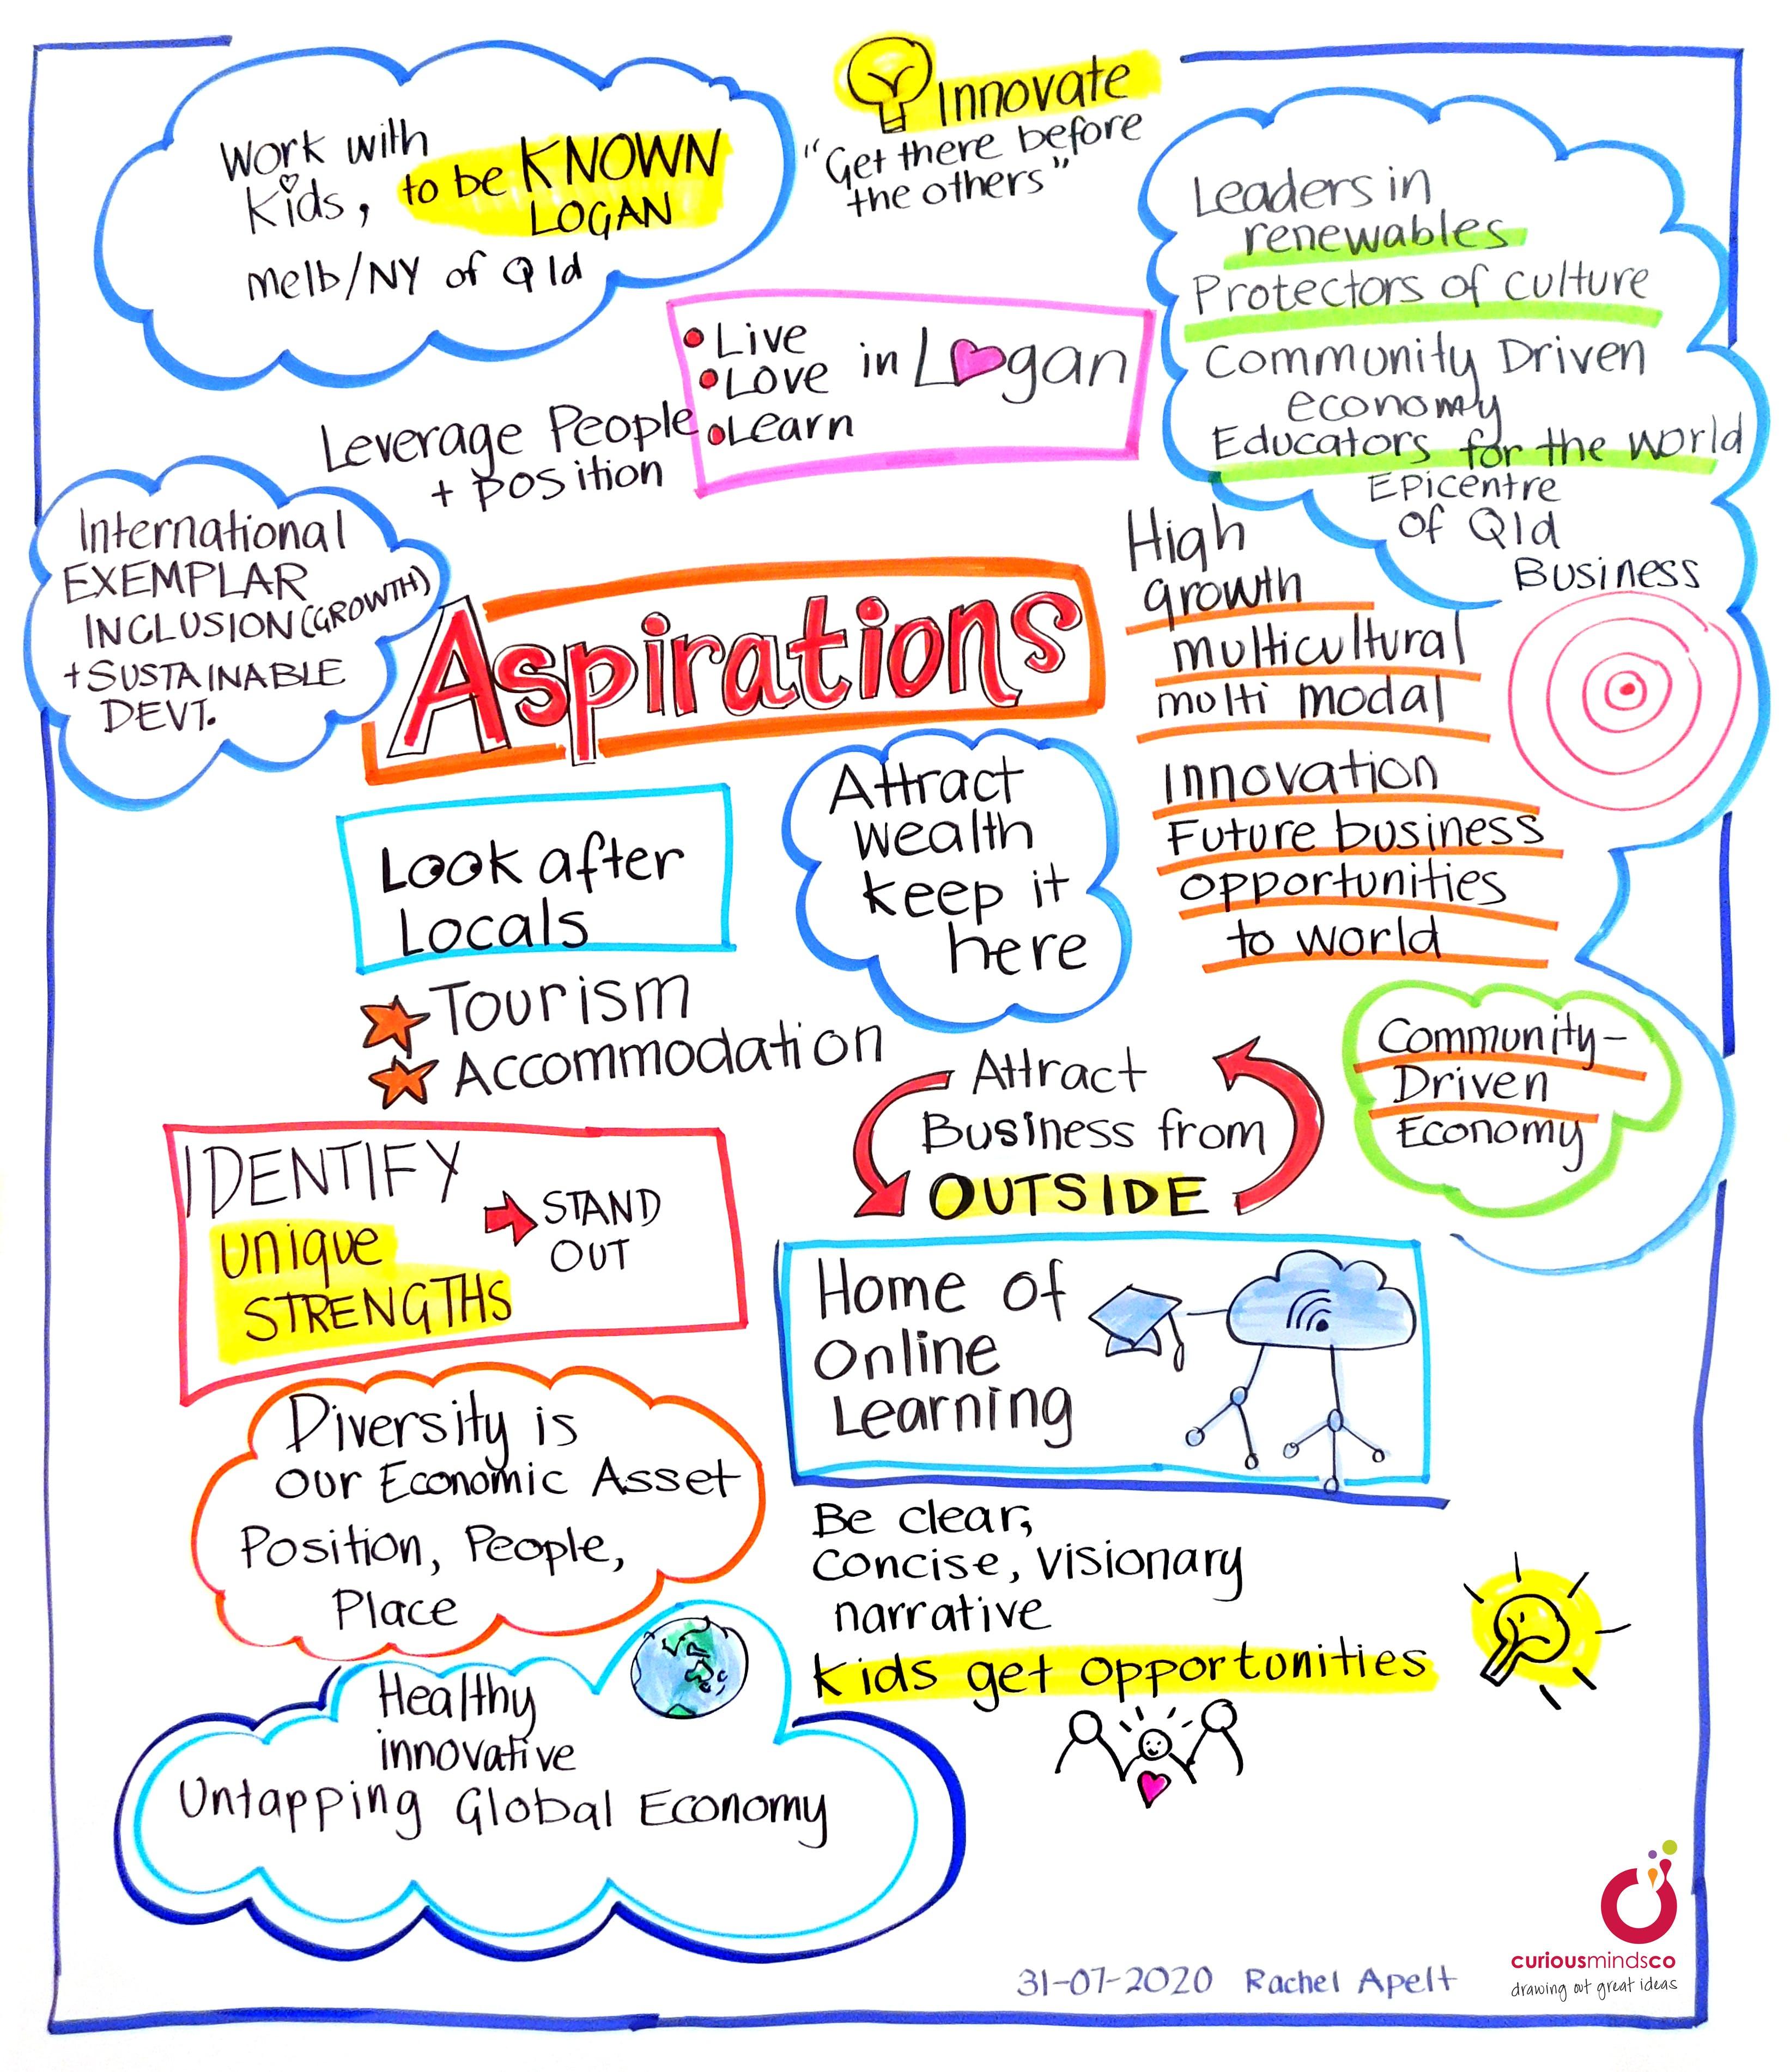 Logan Economic Aspirations Diagram.jpg